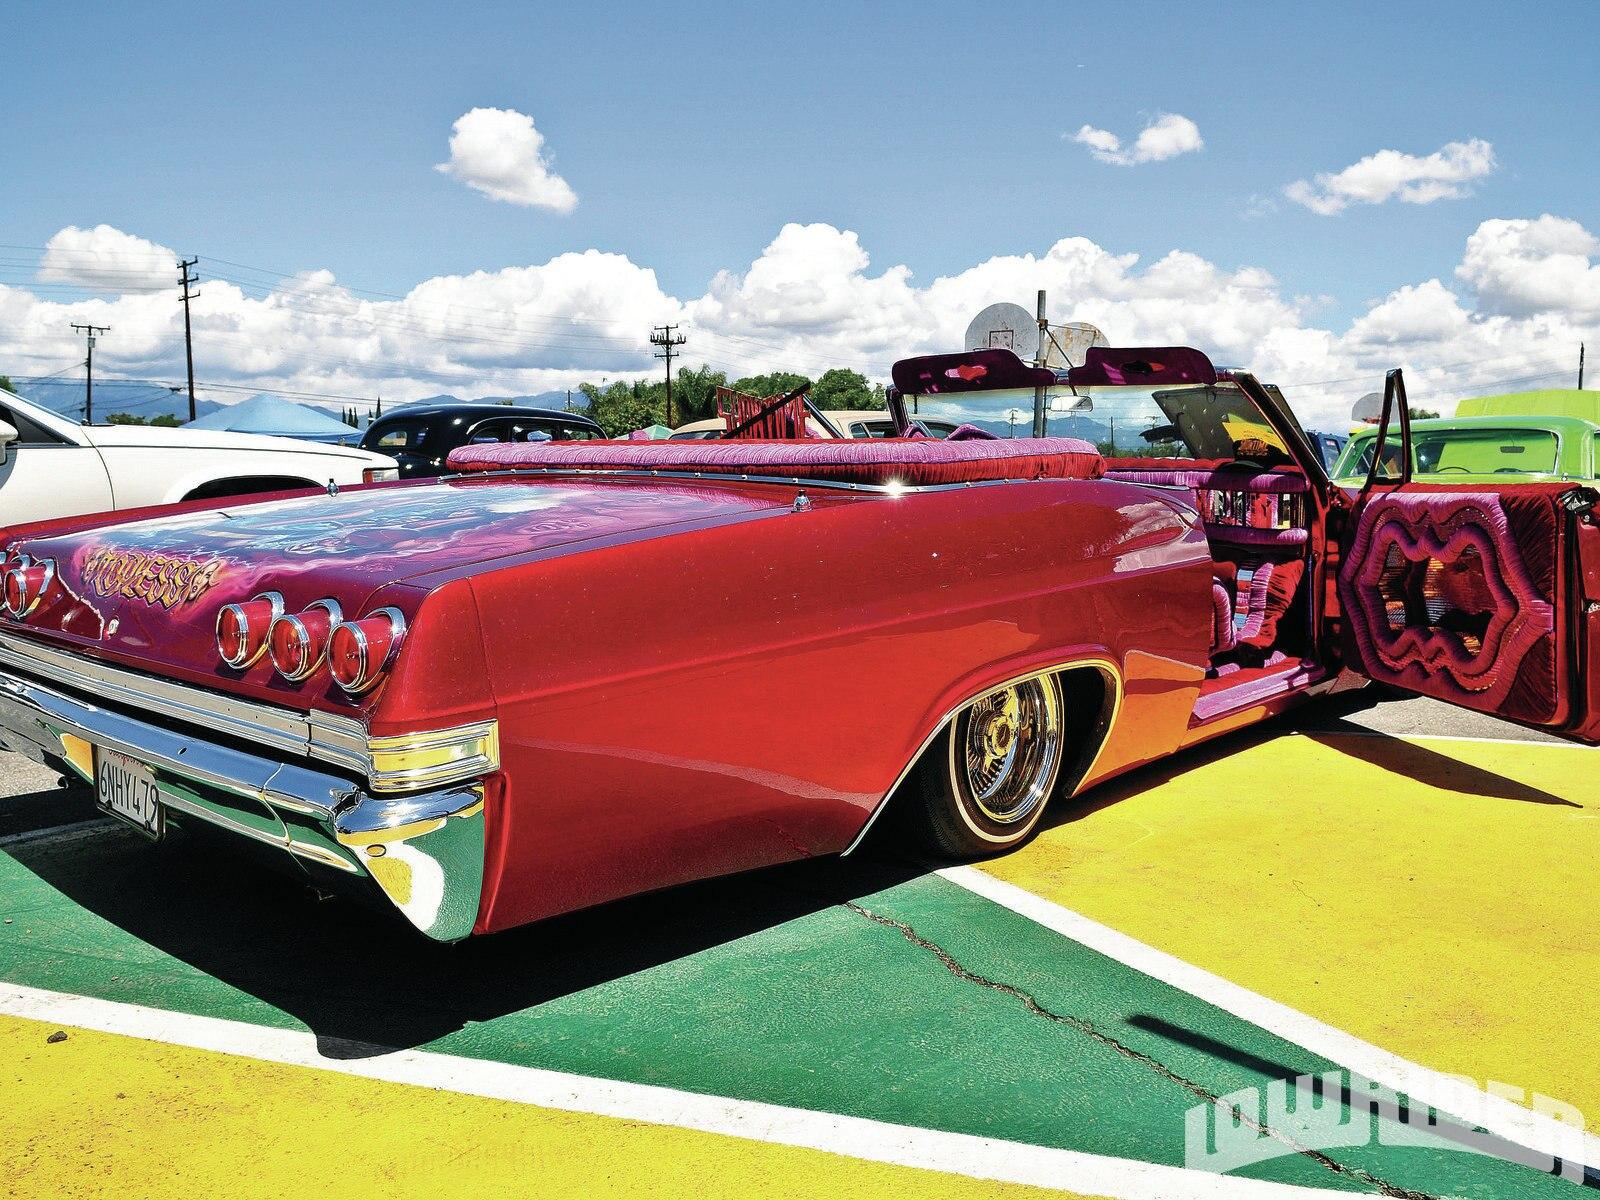 1201-lrmp-01-o-royal-image-show-local-school-fundraiser-lowrider-convertible1